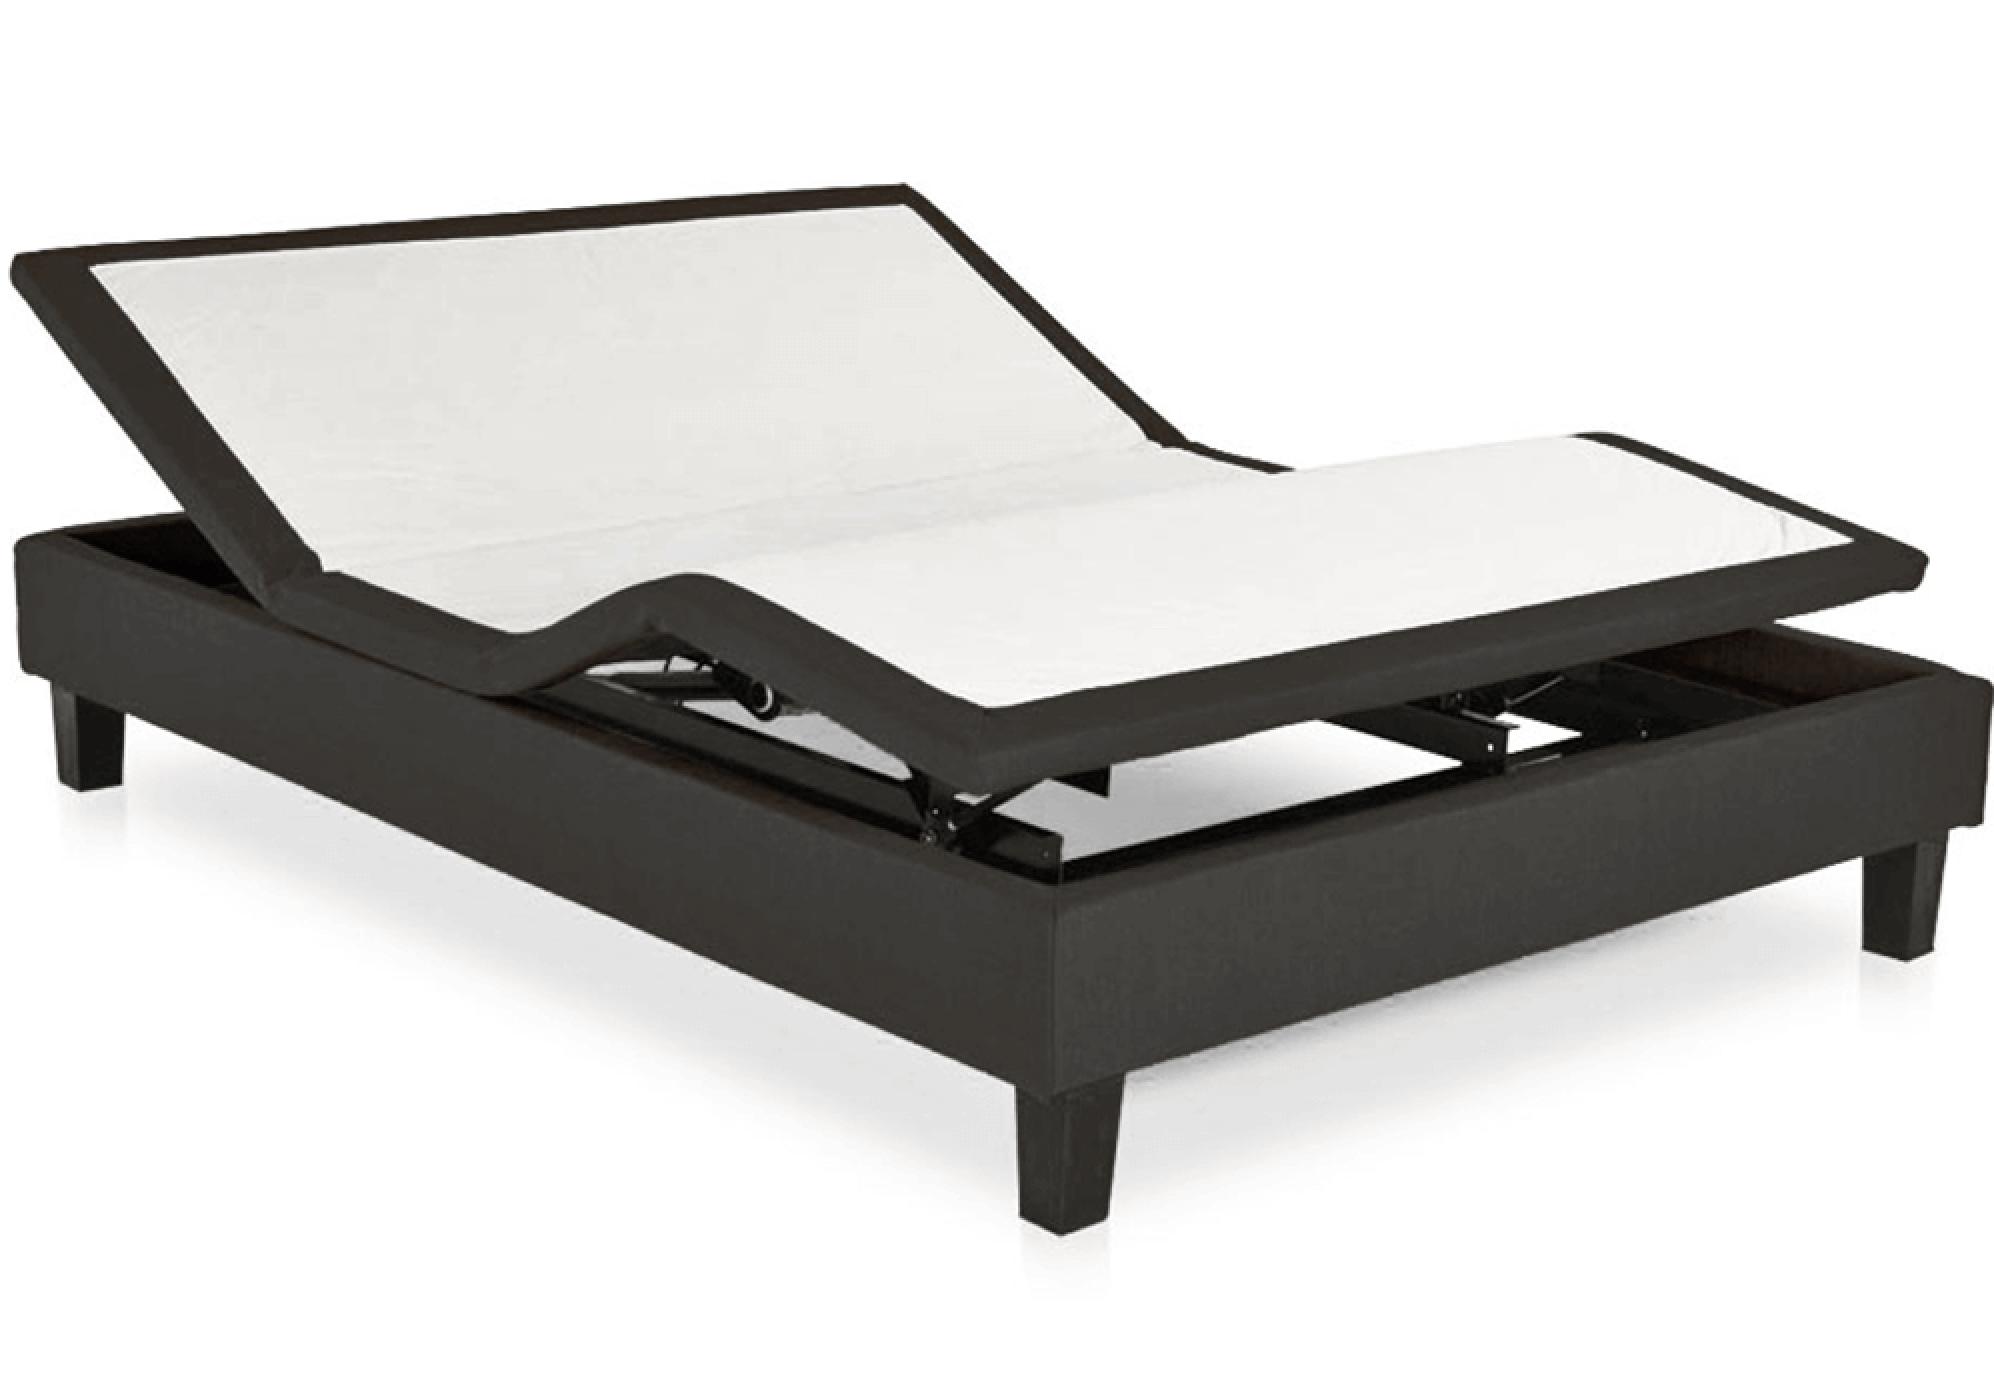 Adjustable Bed Base Reviews